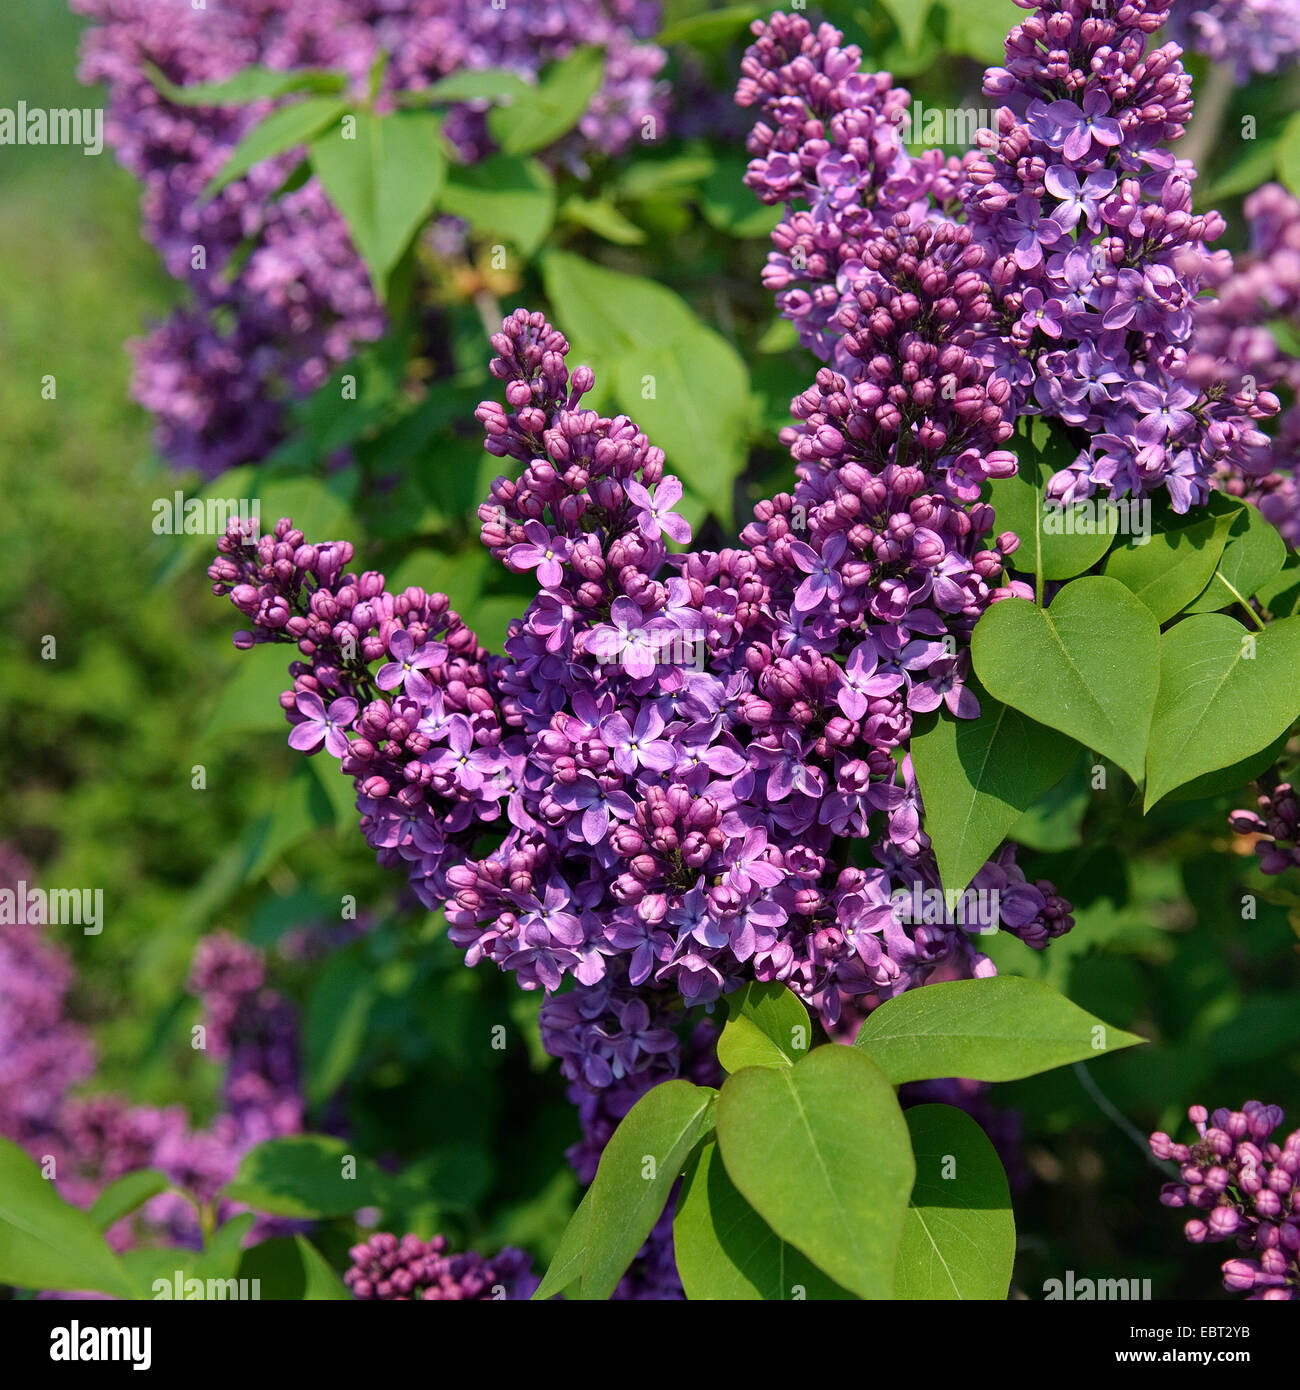 common lilac syringa vulgaris 39 ruhm von horstenstein 39 syringa stock photo royalty free image. Black Bedroom Furniture Sets. Home Design Ideas